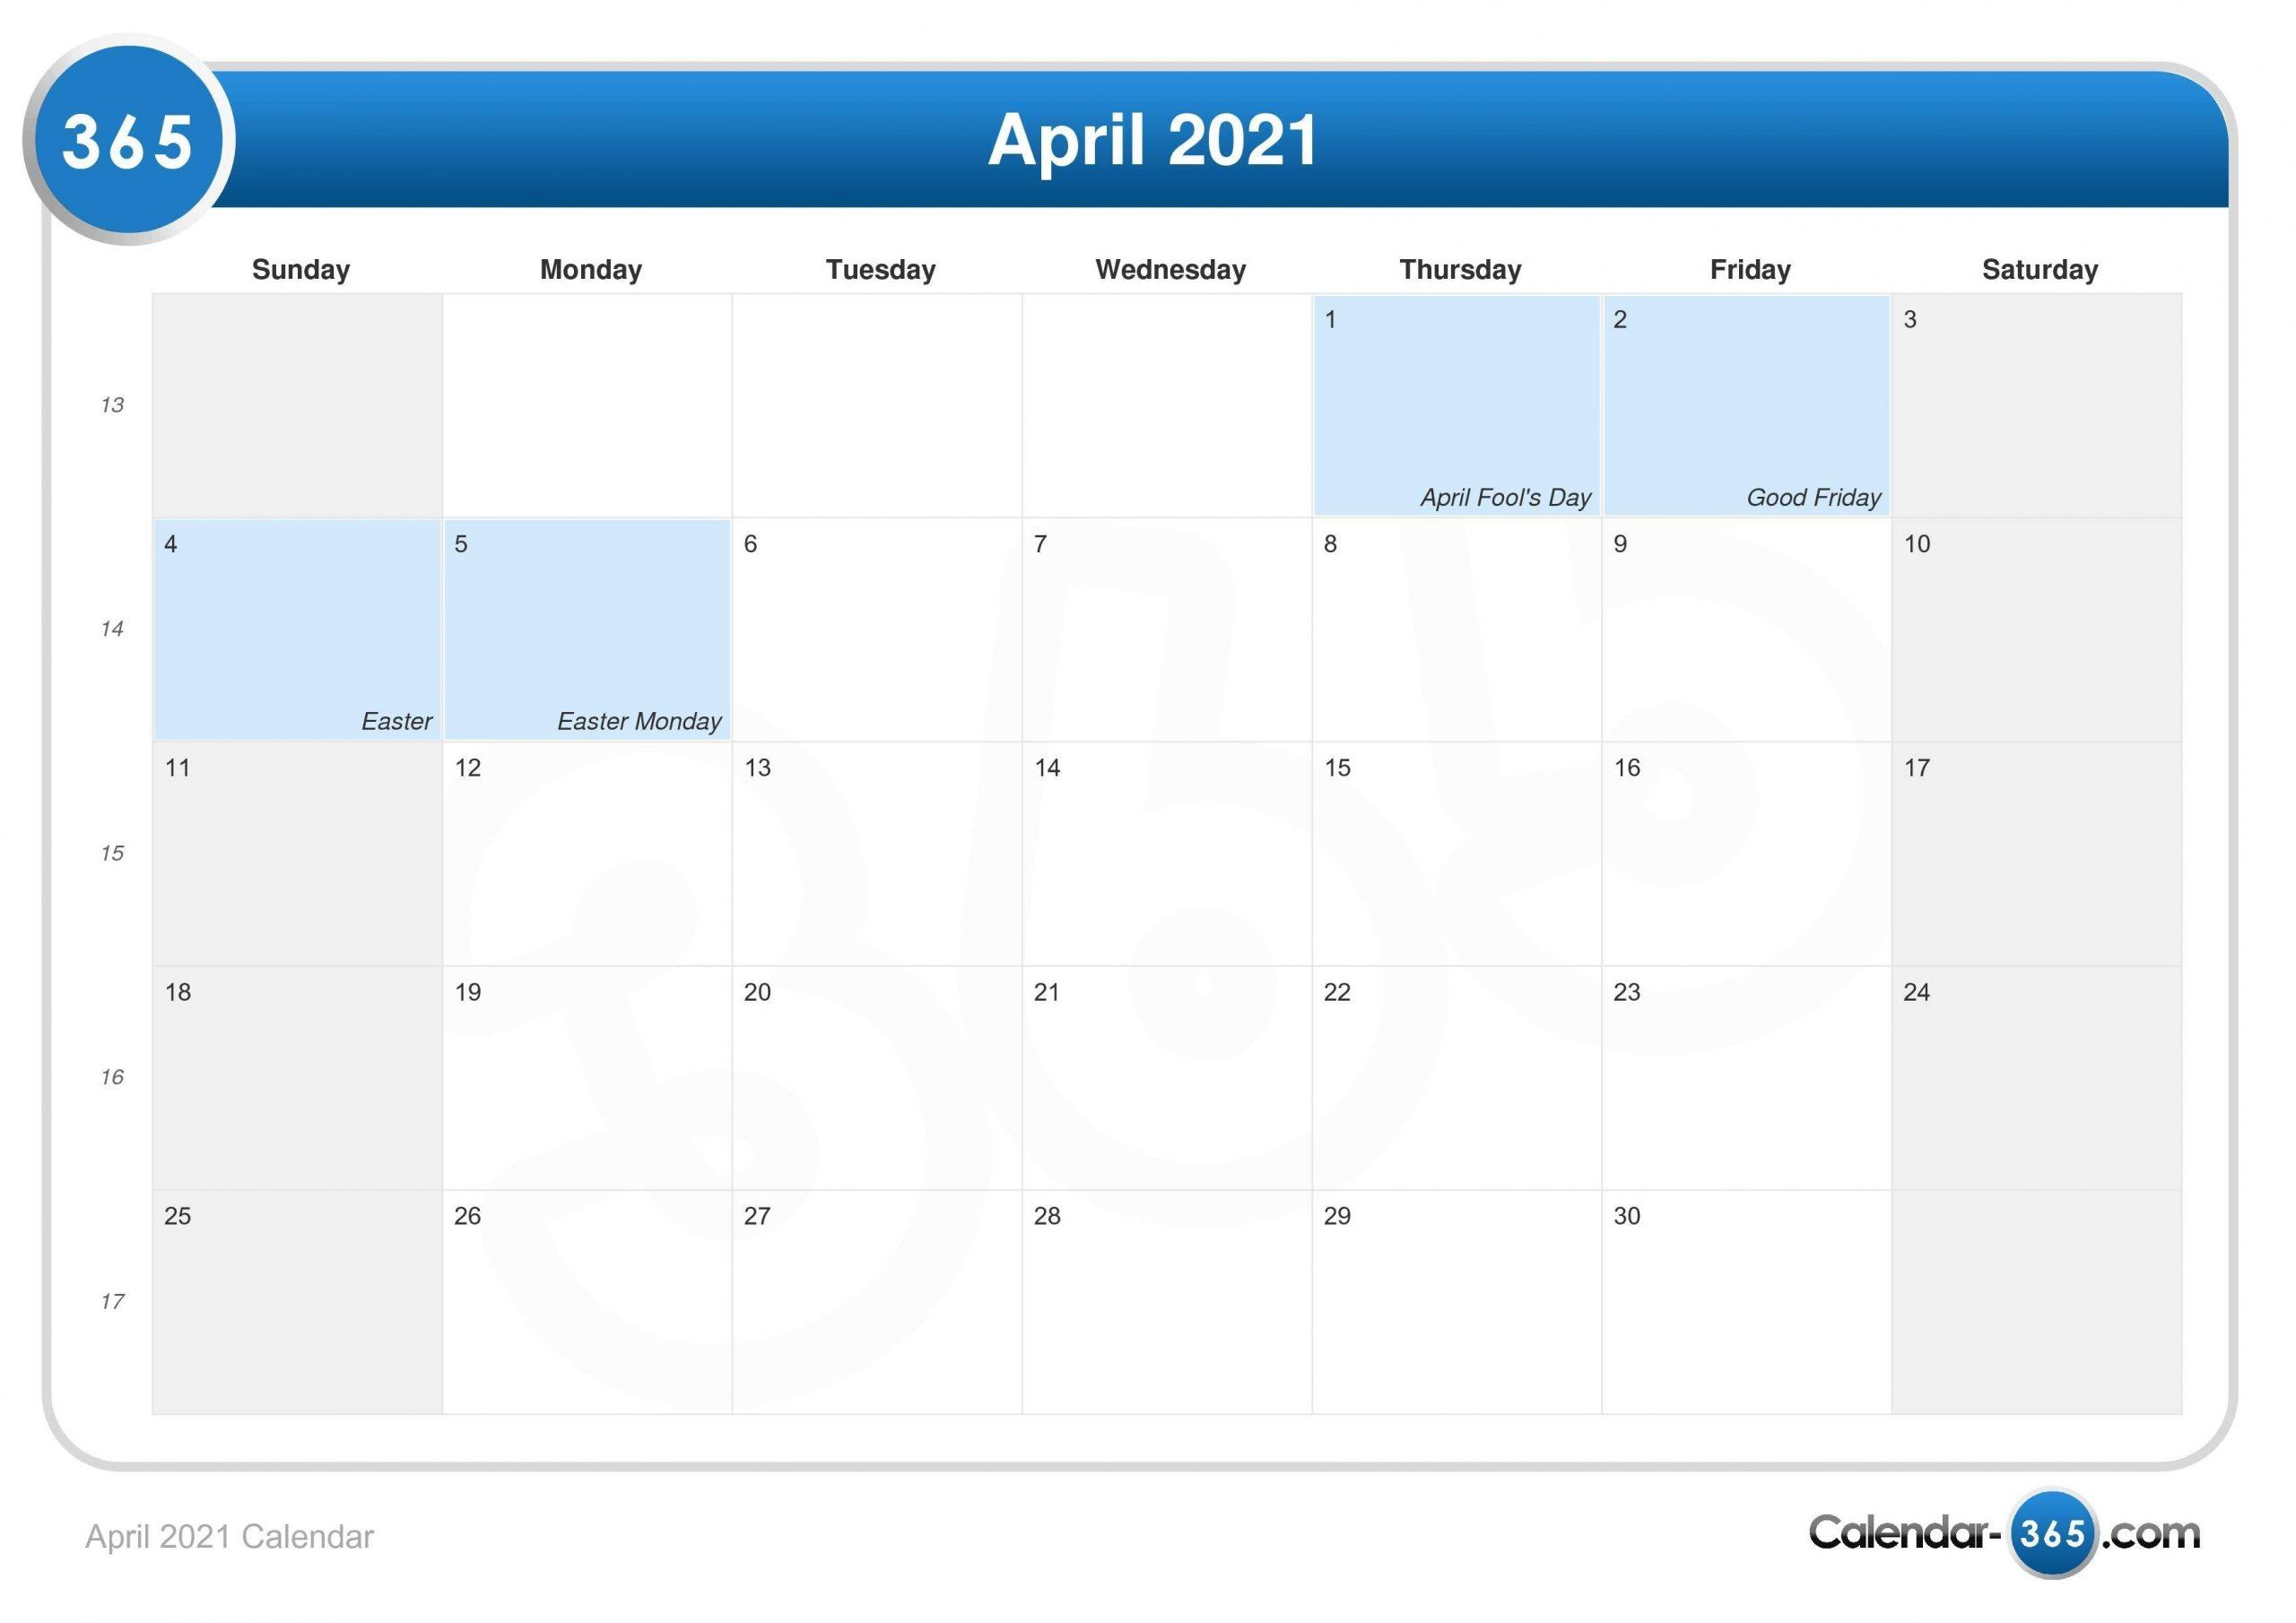 Take Calendar Of April 2021 School